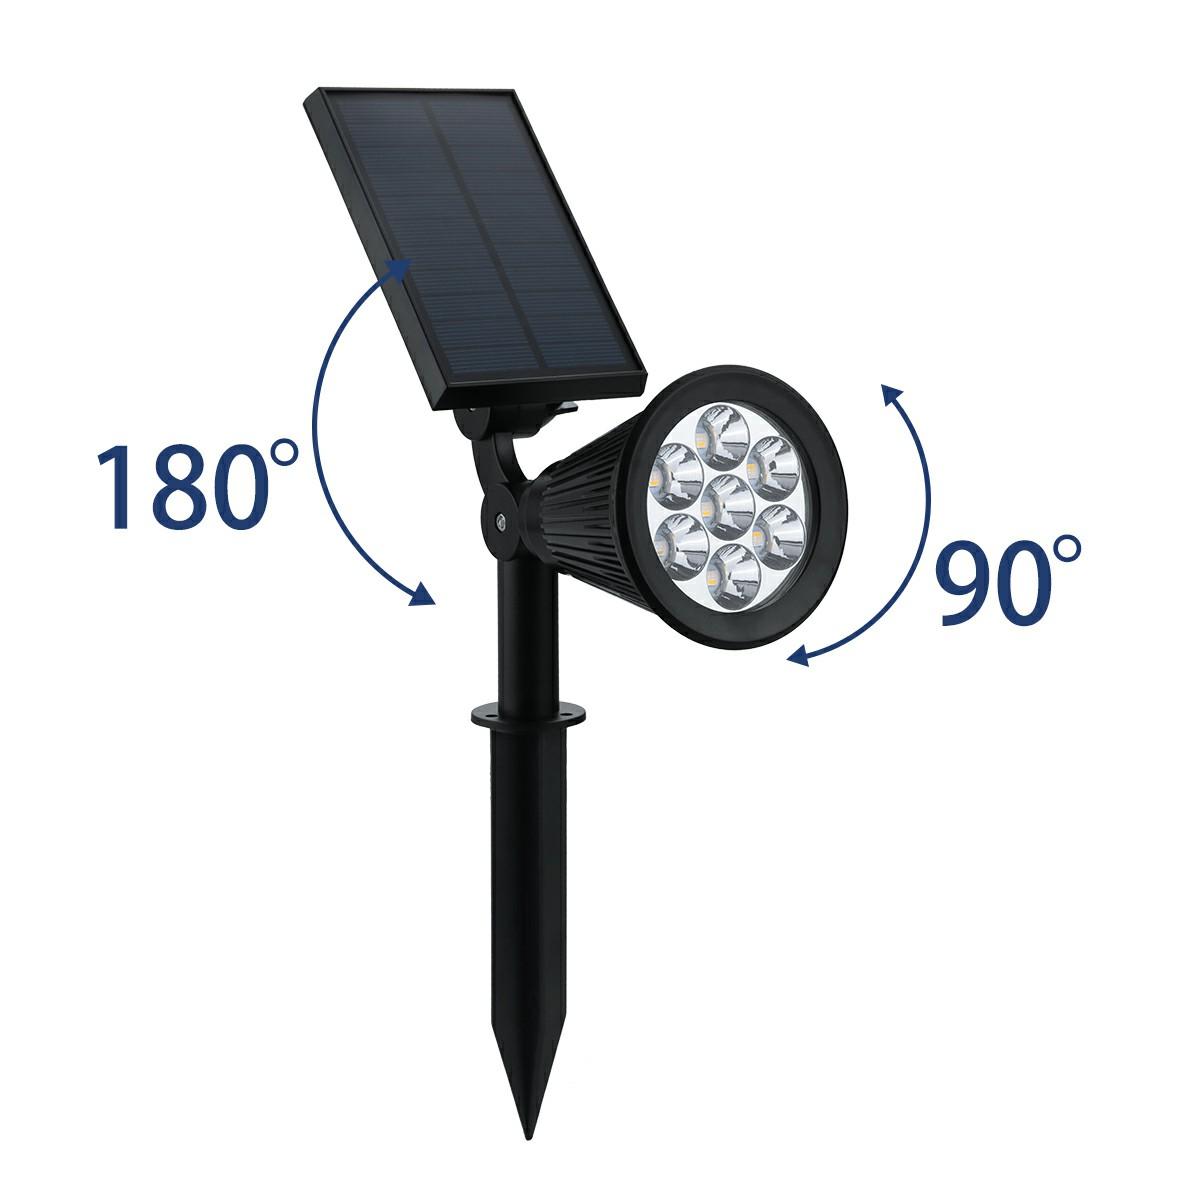 7 LED Discoloration Solar Lights Insert Floor Lawn Garden Lights Party Lights Decor Lamp